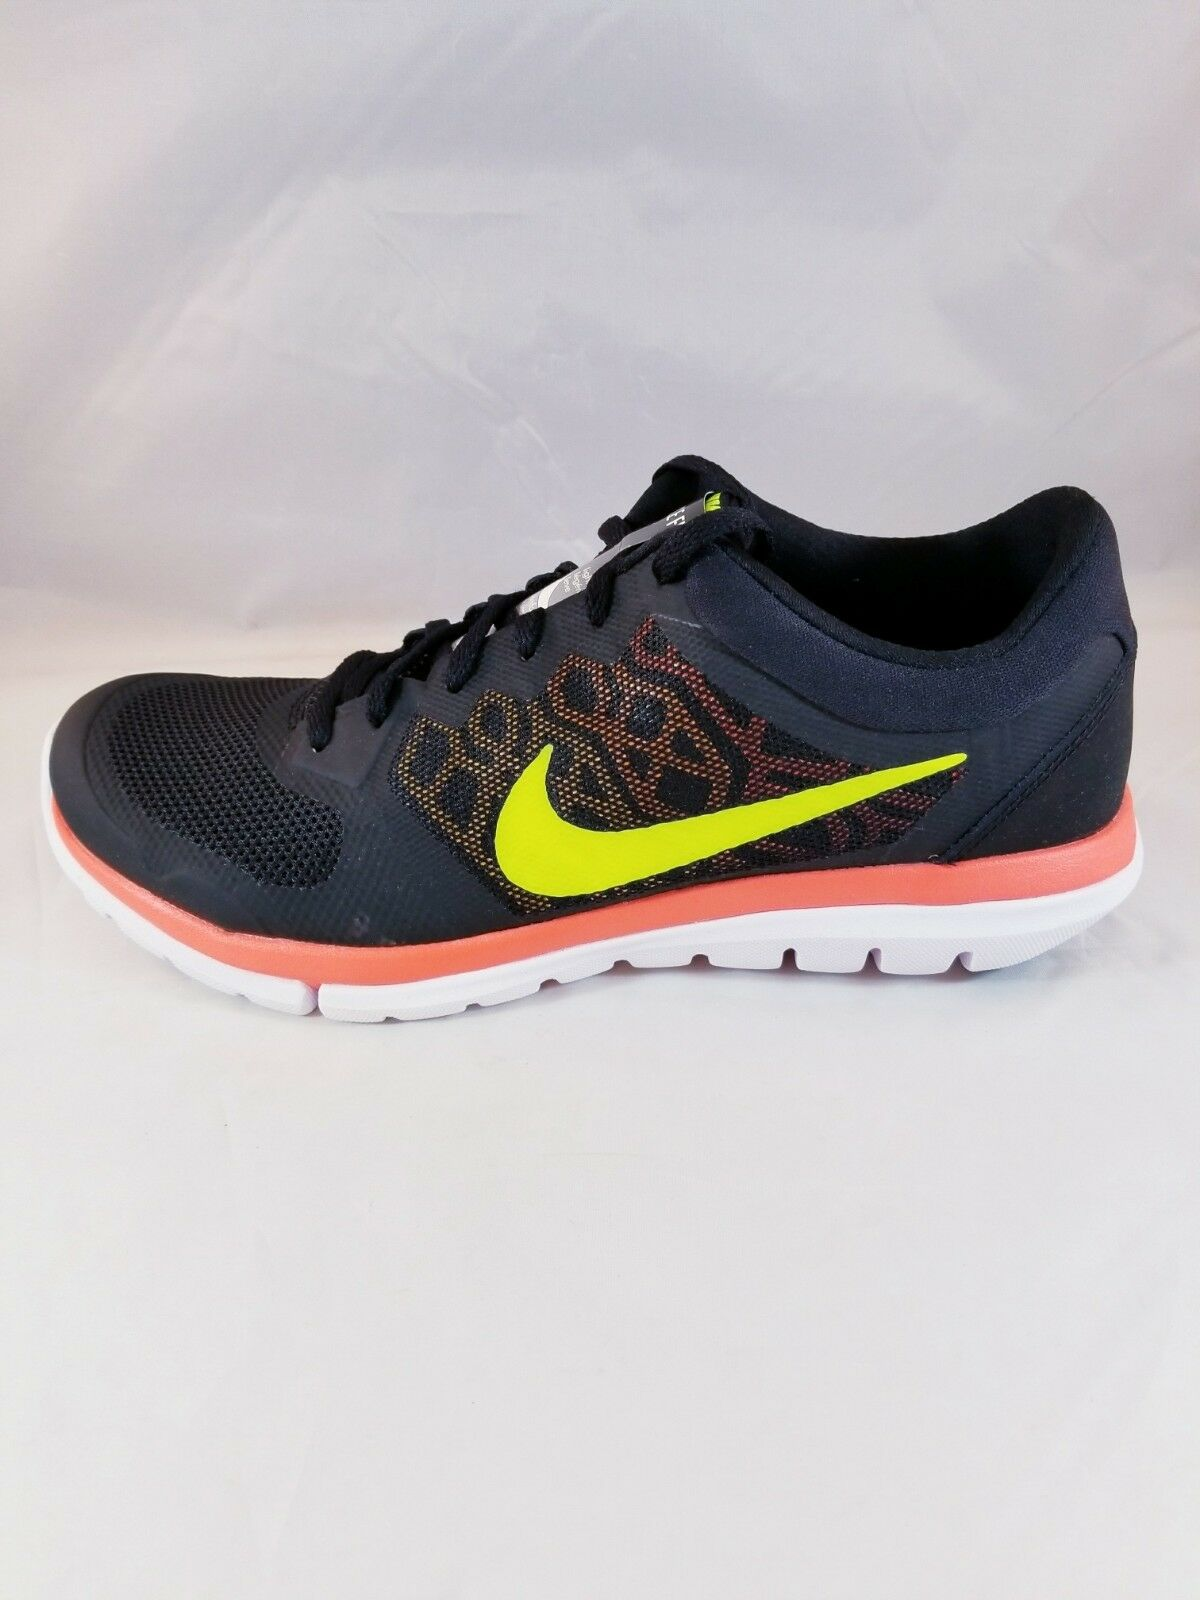 Nike Flex 2018 RN Men's Running Shoe 709022 017 Size 9.5